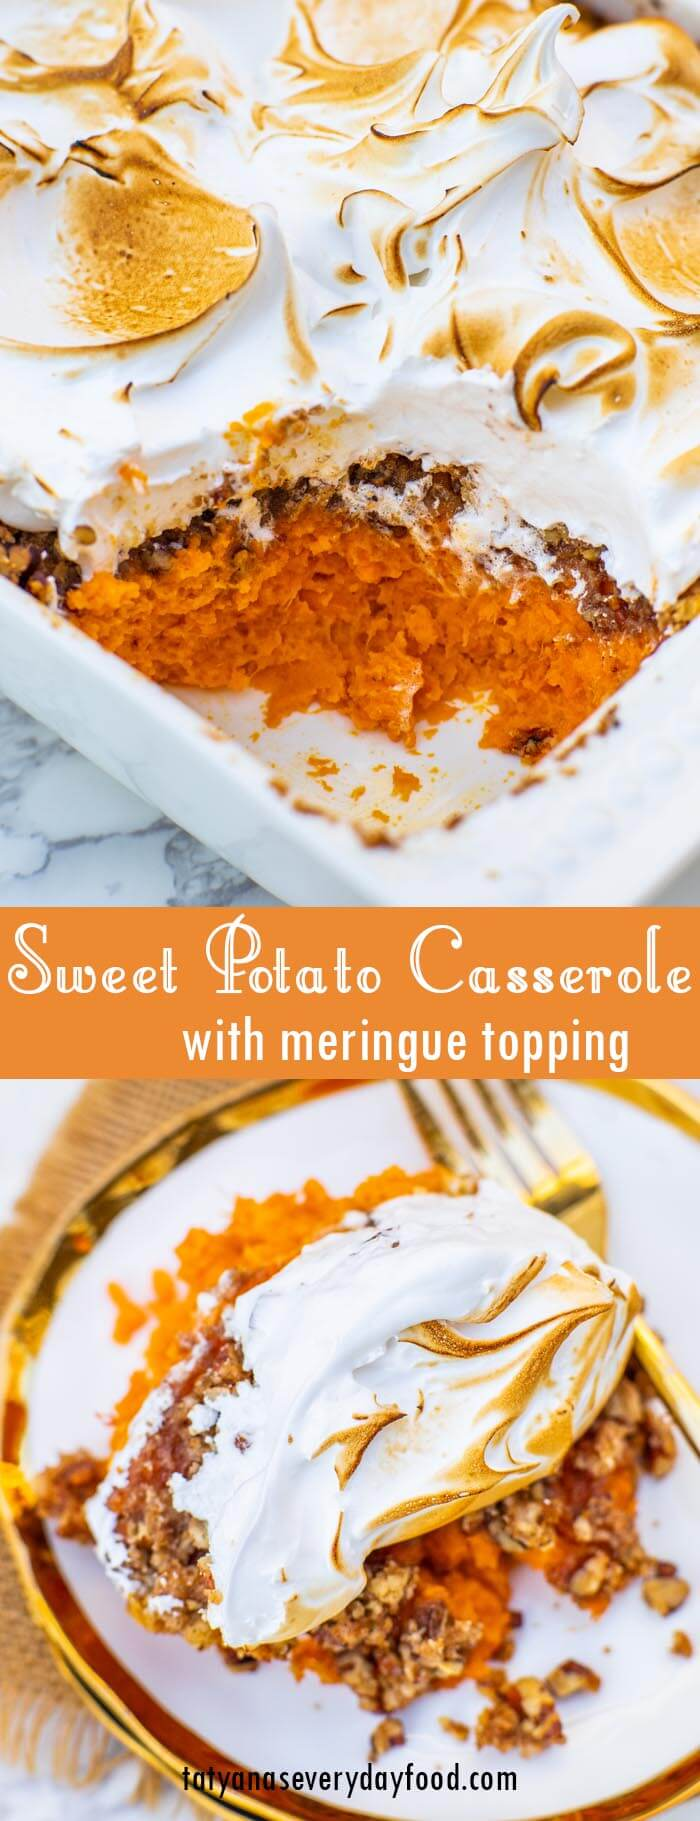 Sweet Potato Casserole video recipe